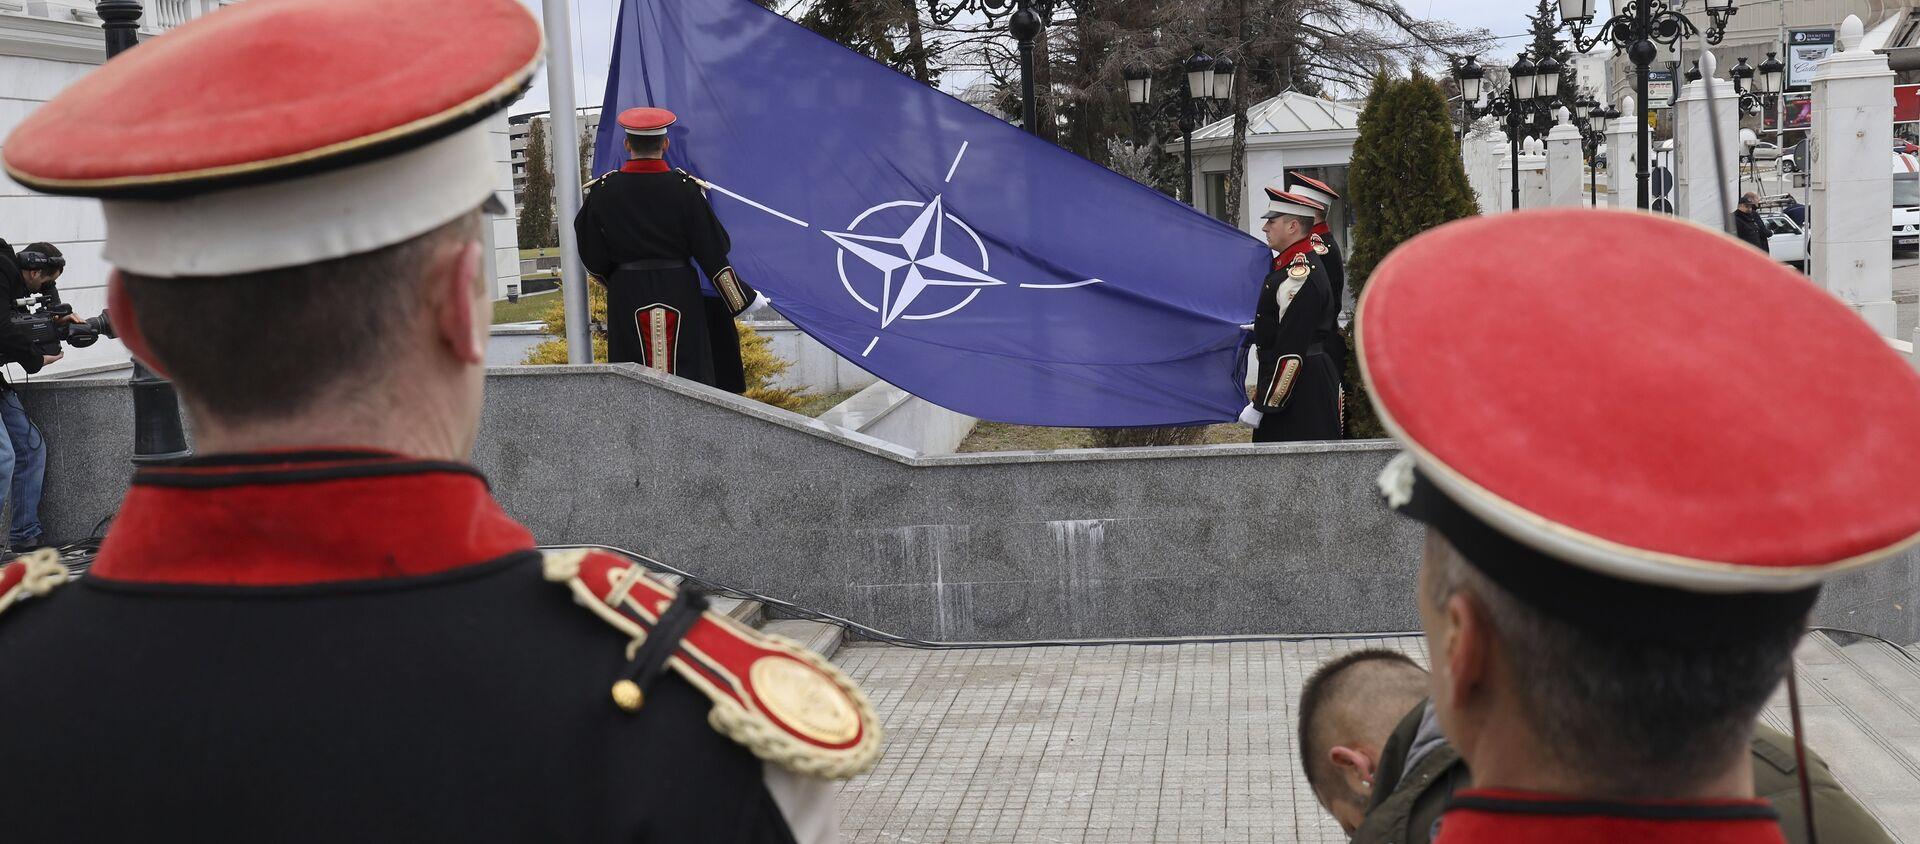 Flaga NATO w Skopje - Sputnik Polska, 1920, 19.10.2019